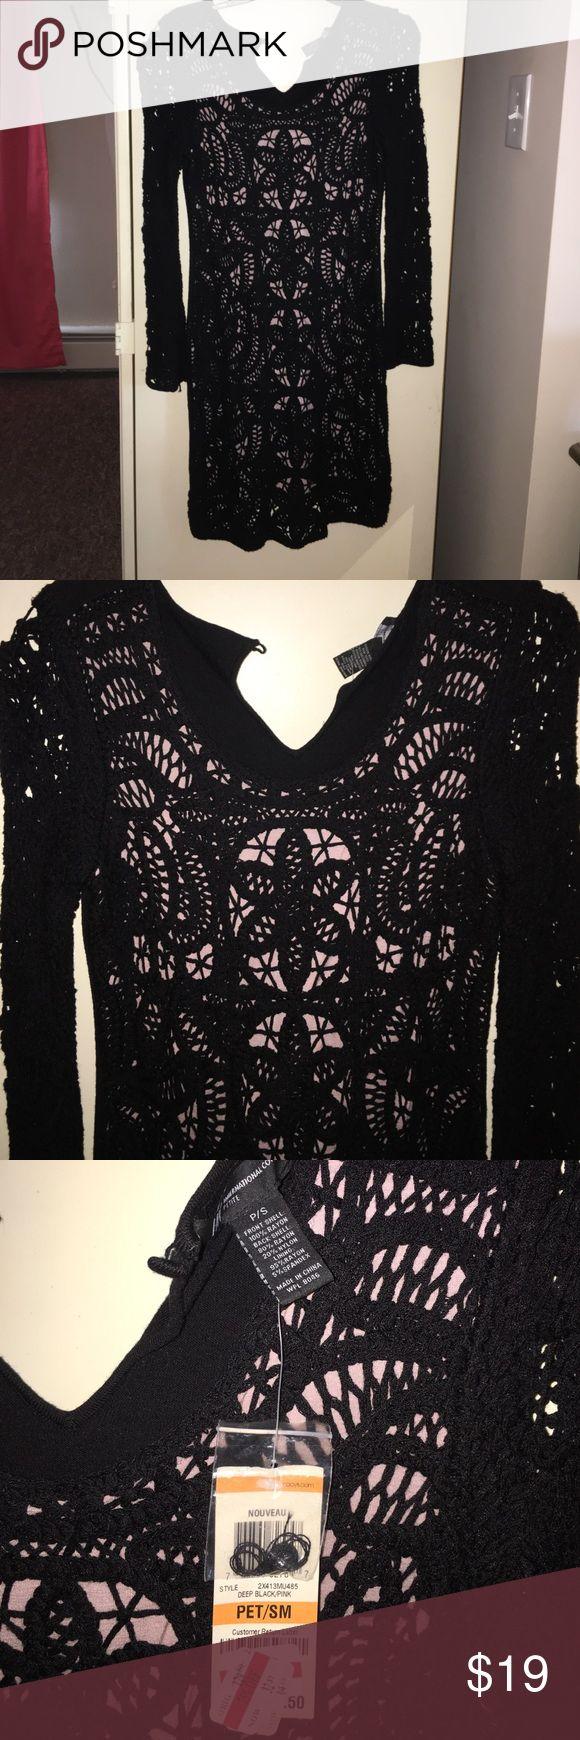 Crochet dress INC black crochet dress with pink on inside. Never worn size petite small INC International Concepts Dresses